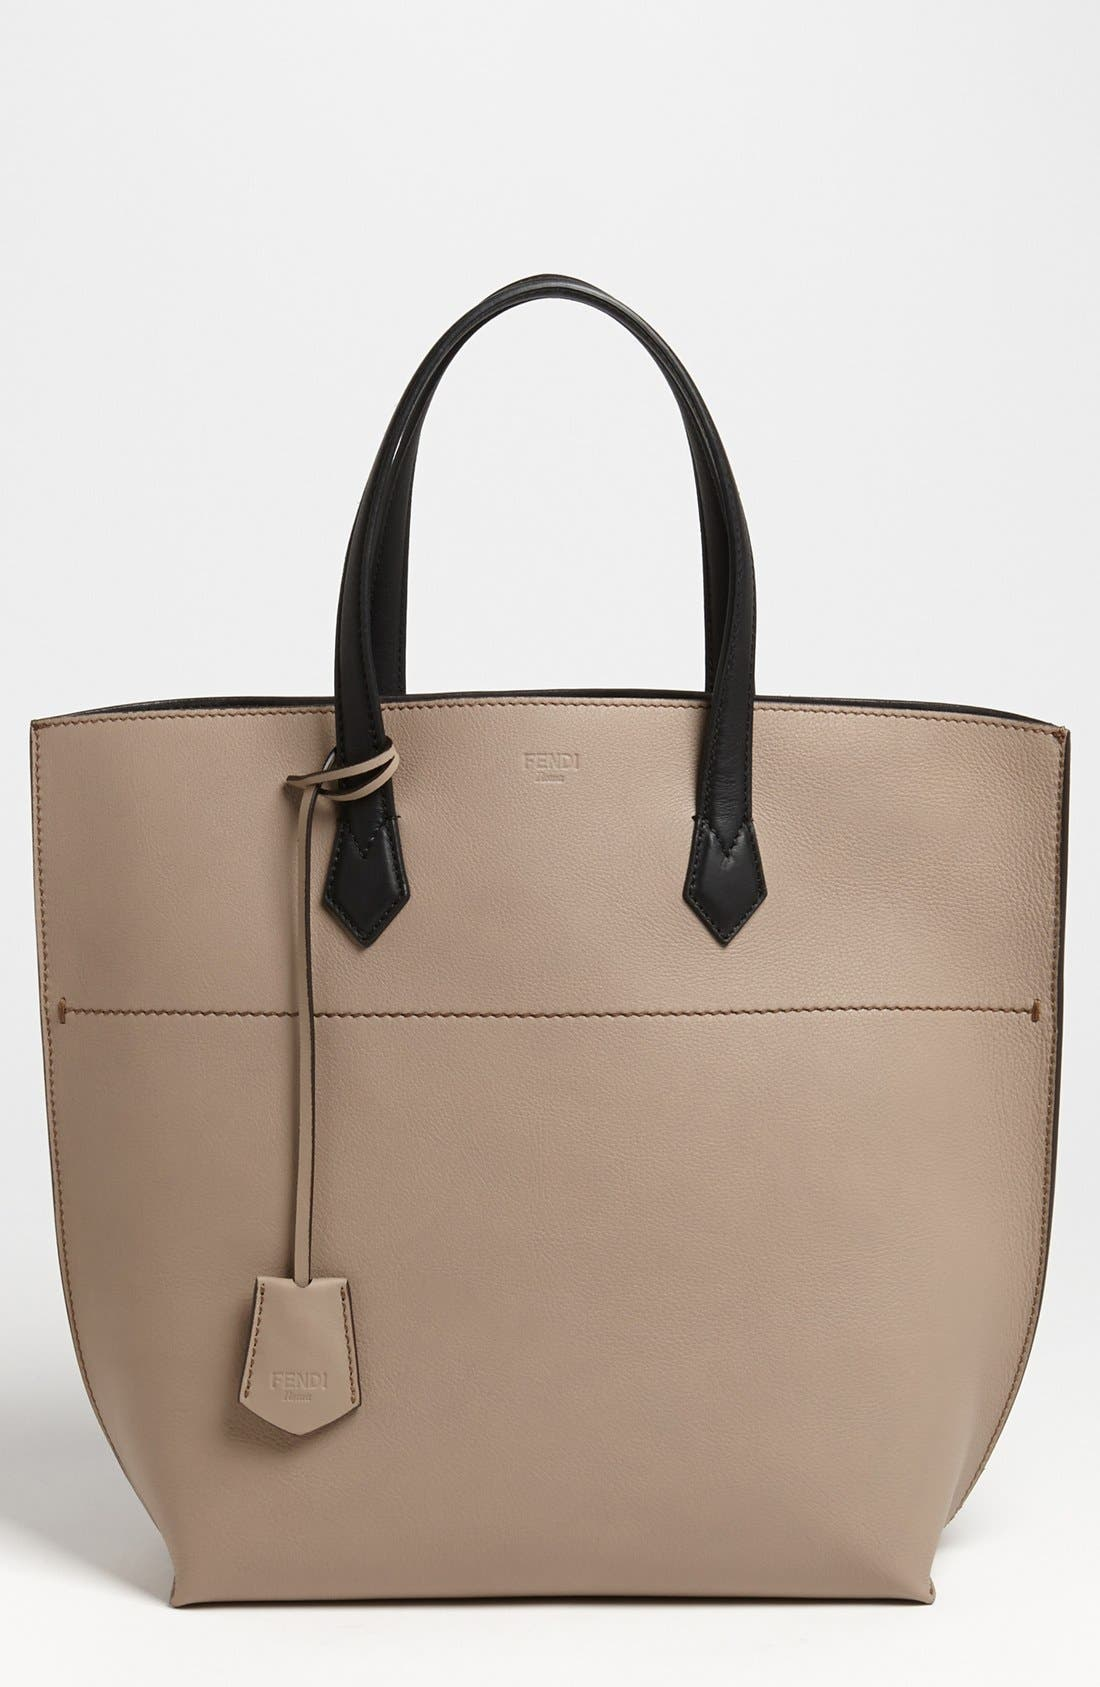 Alternate Image 1 Selected - Fendi 'All In' Leather Shopper